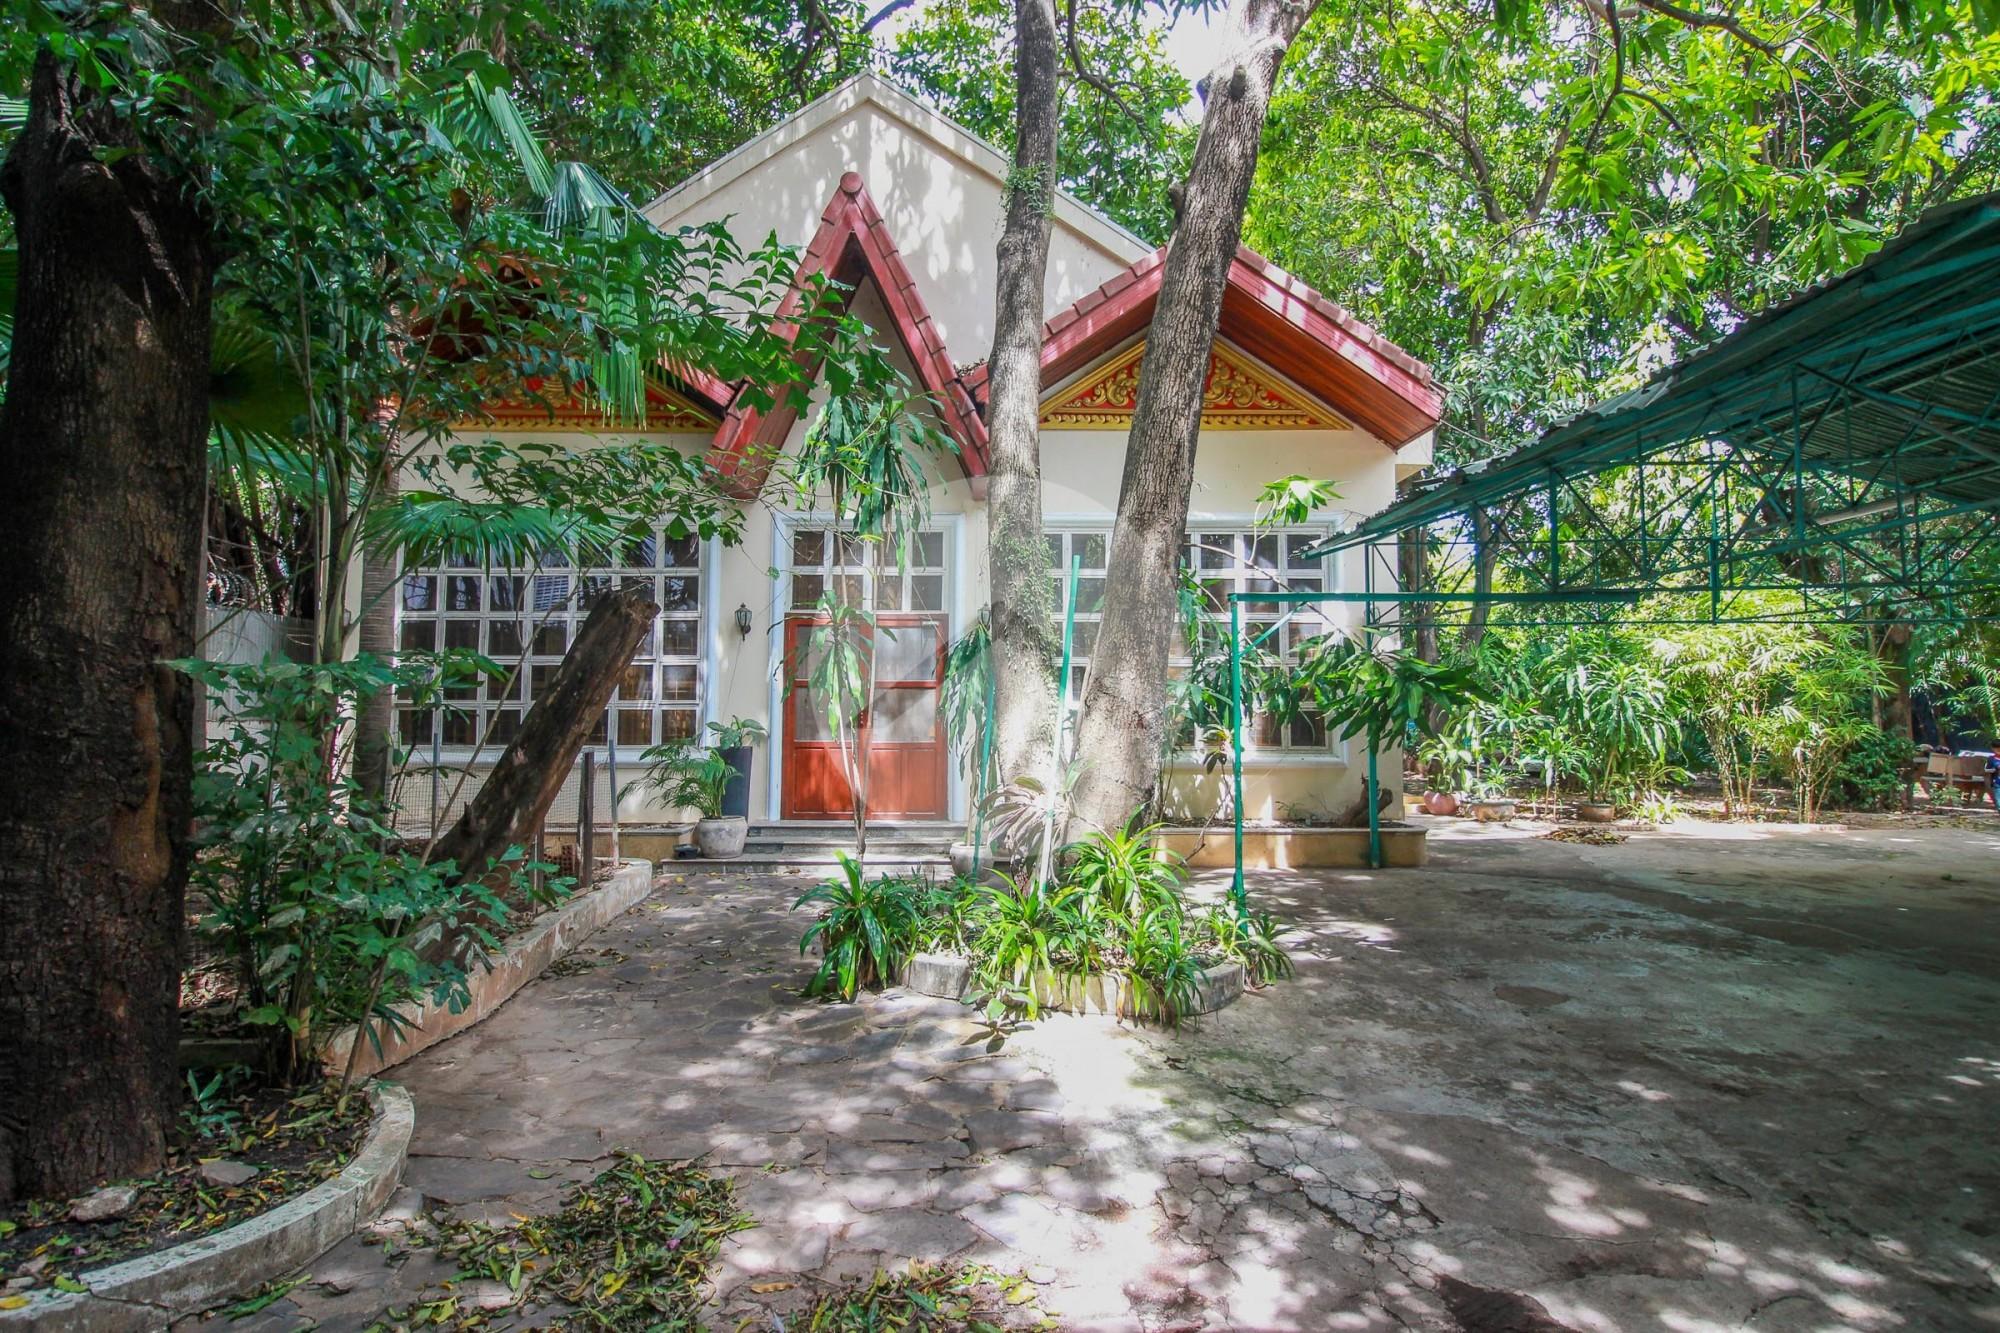 3 Bedroom Villa with Pool For Rent - Tonle Bassac, Phnom Penh